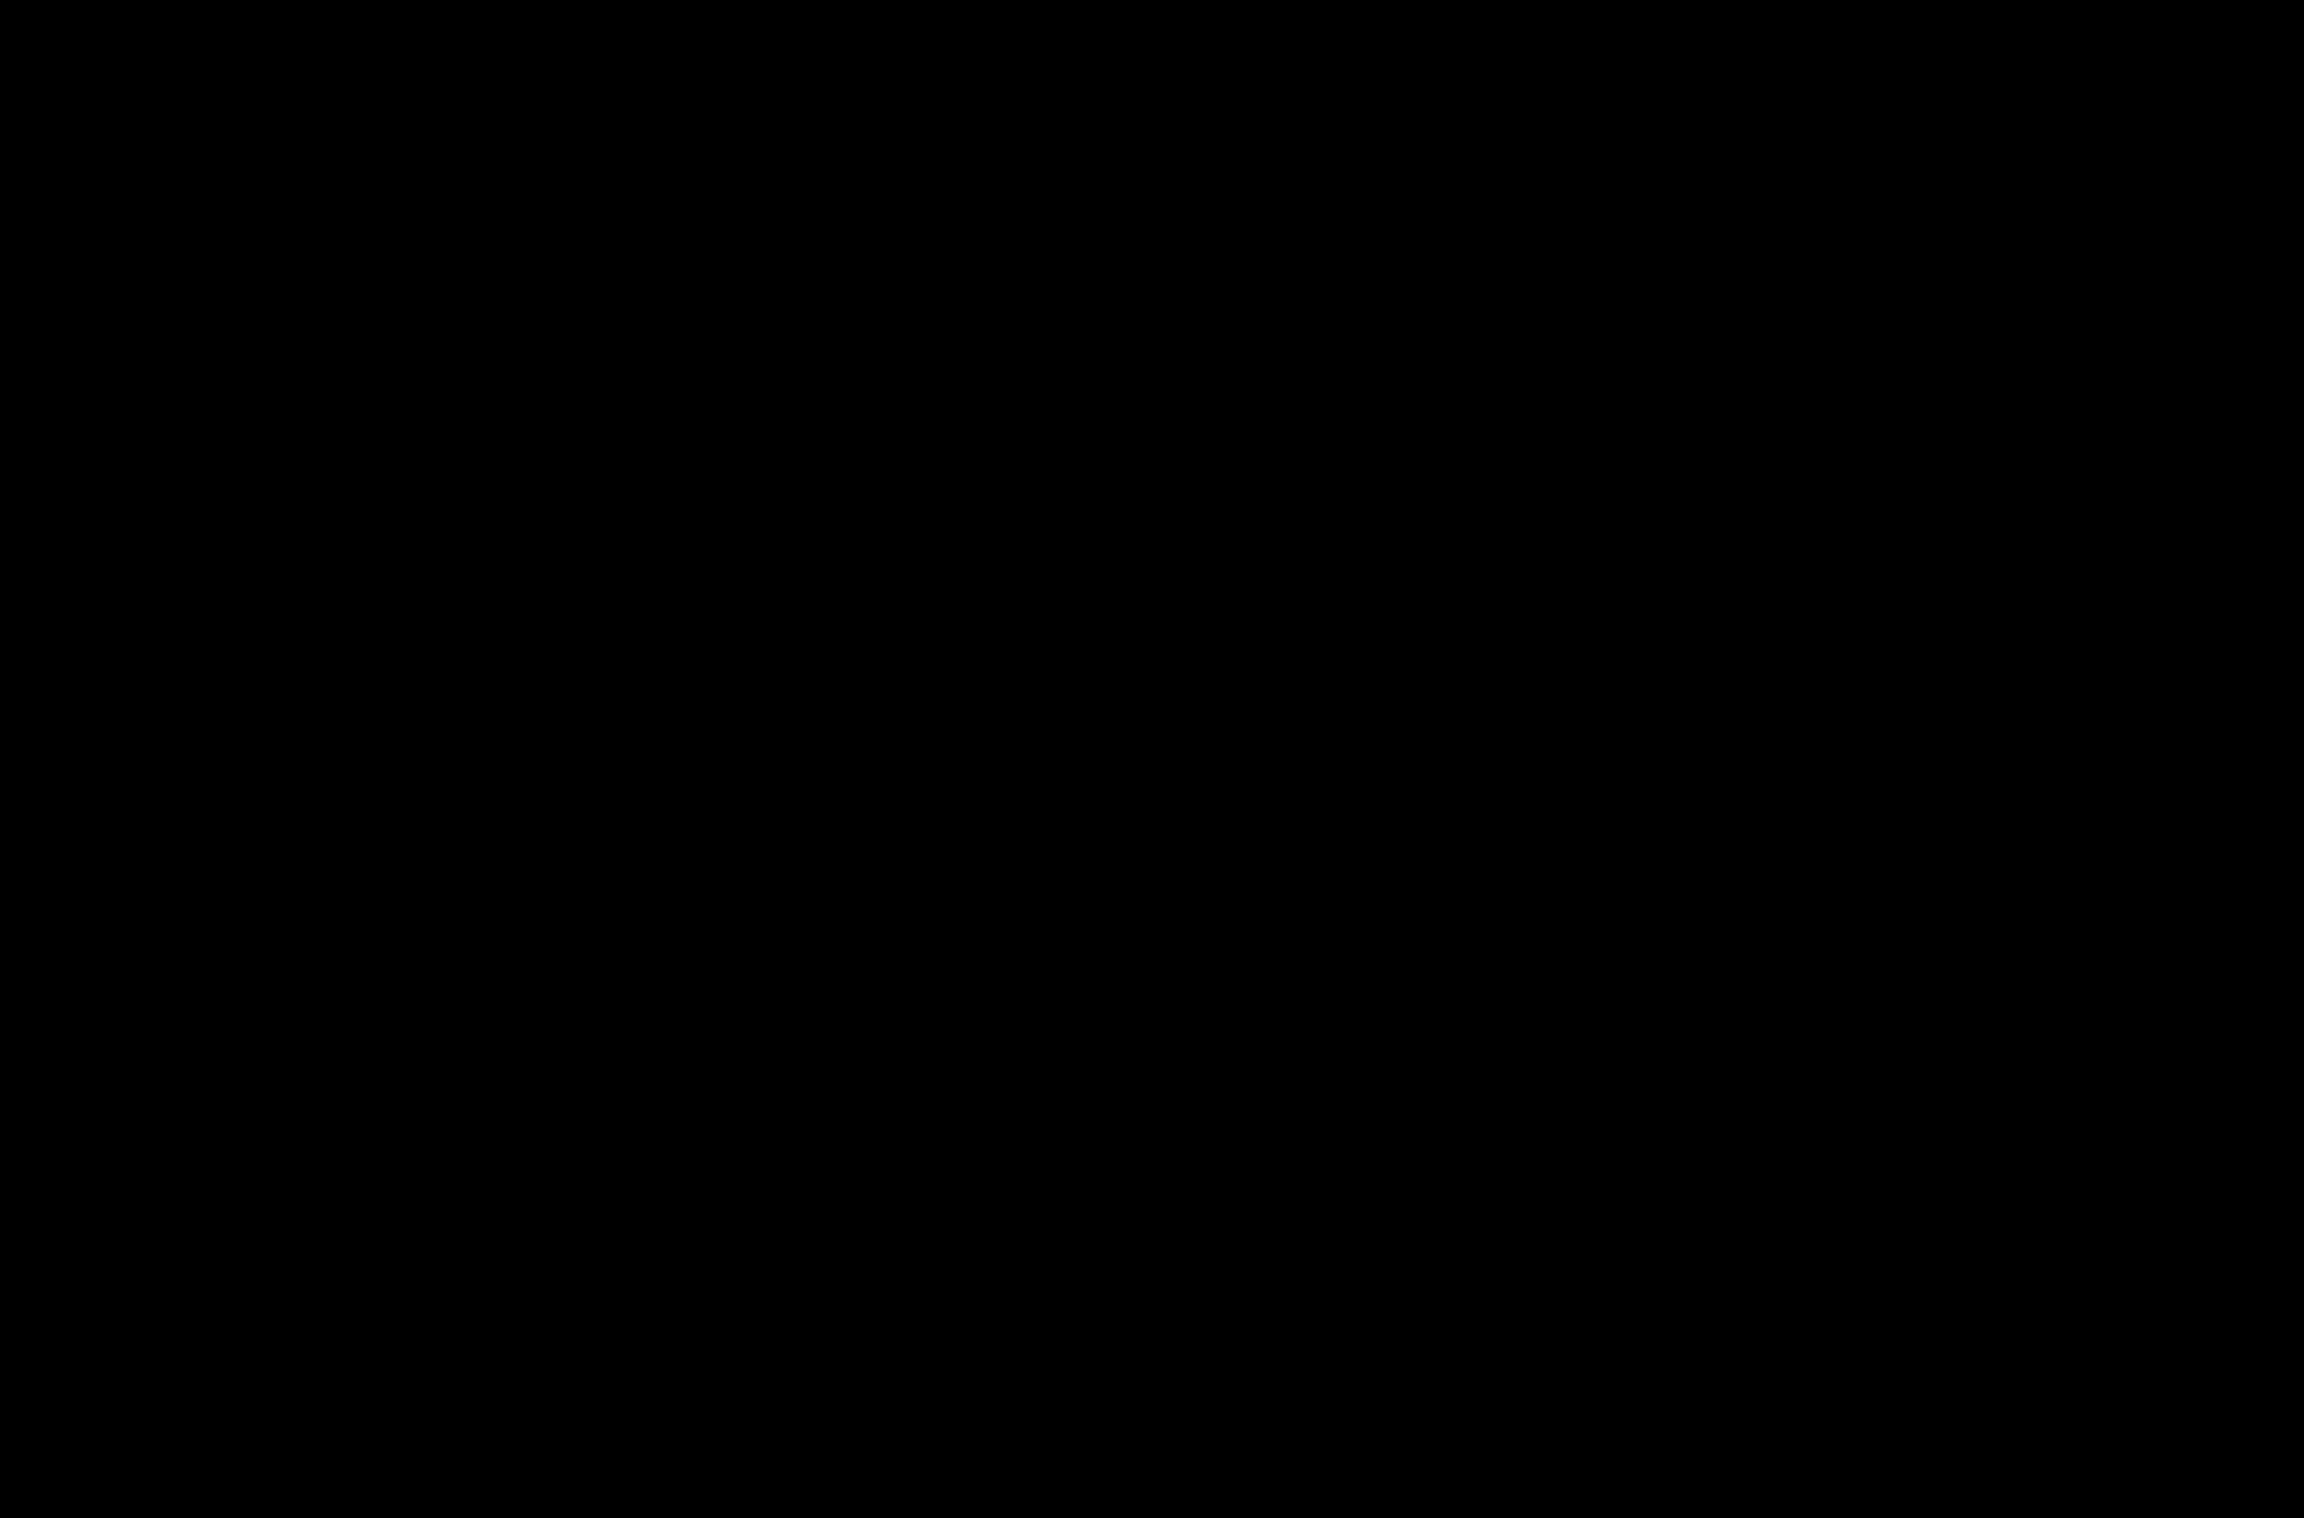 Line Art Horse Head : Clipart stylized horse head line art